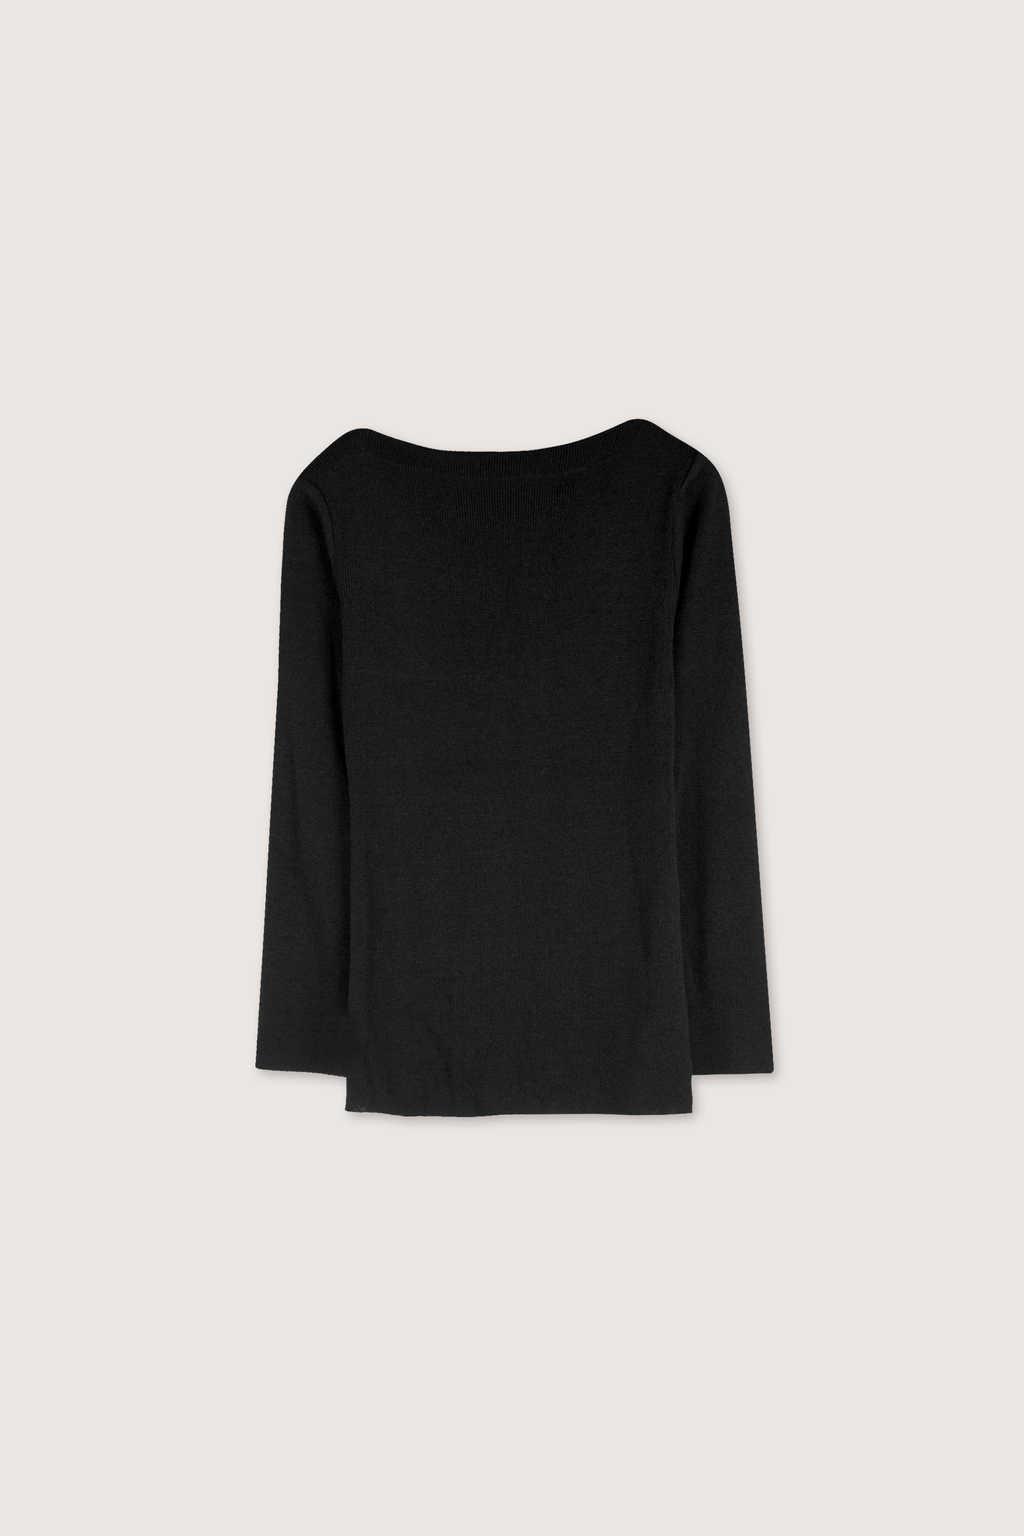 Sweater H059 Black 7